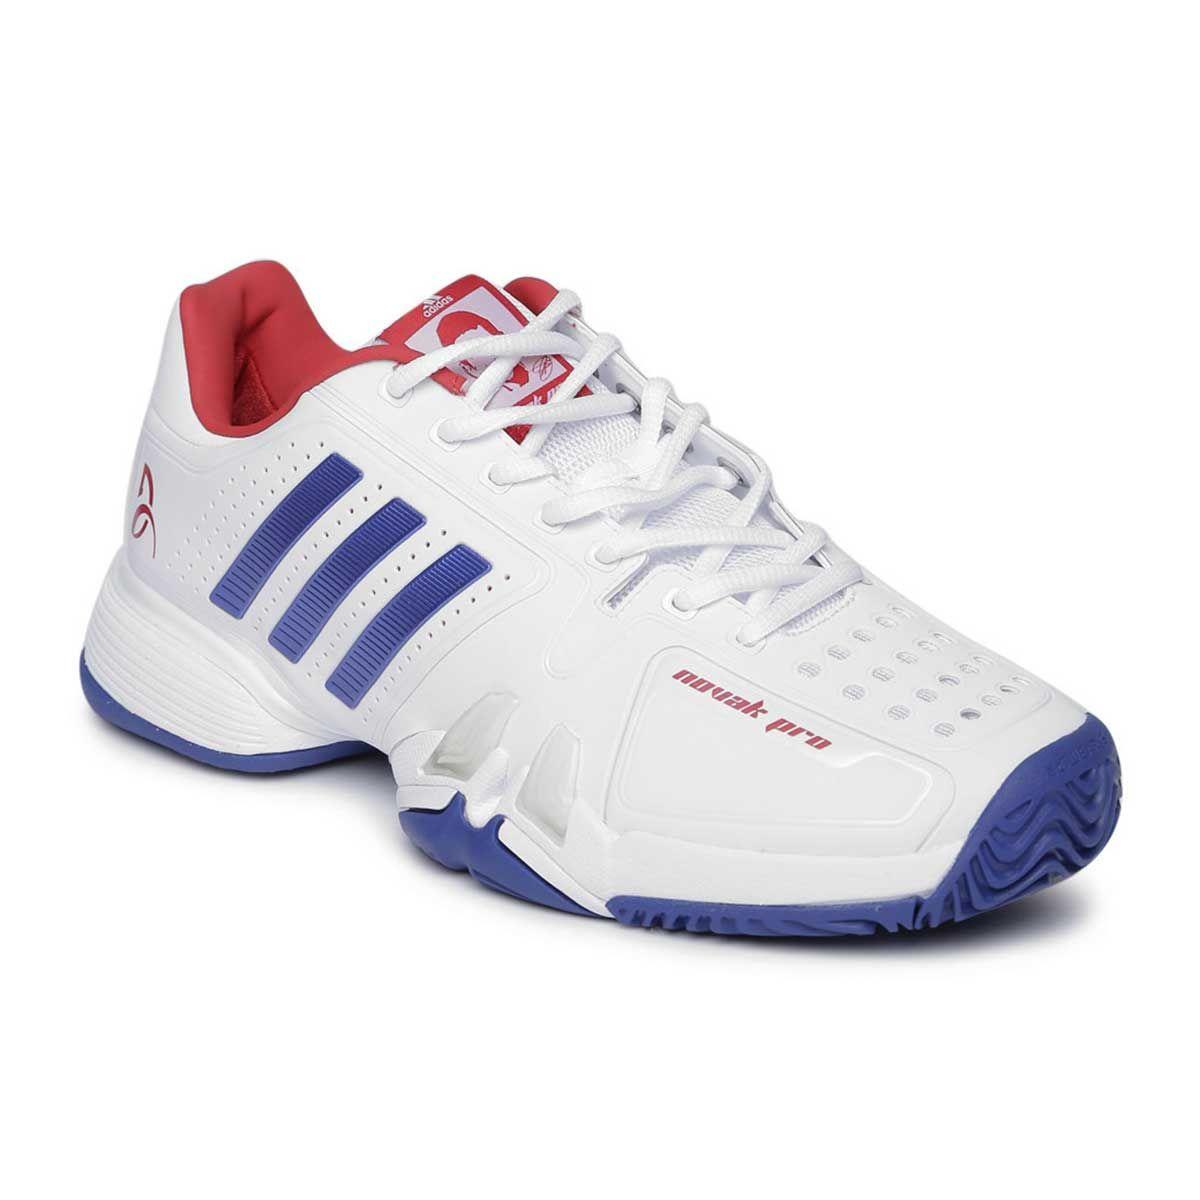 Adidas Tennis Shoes – The Barricade 7